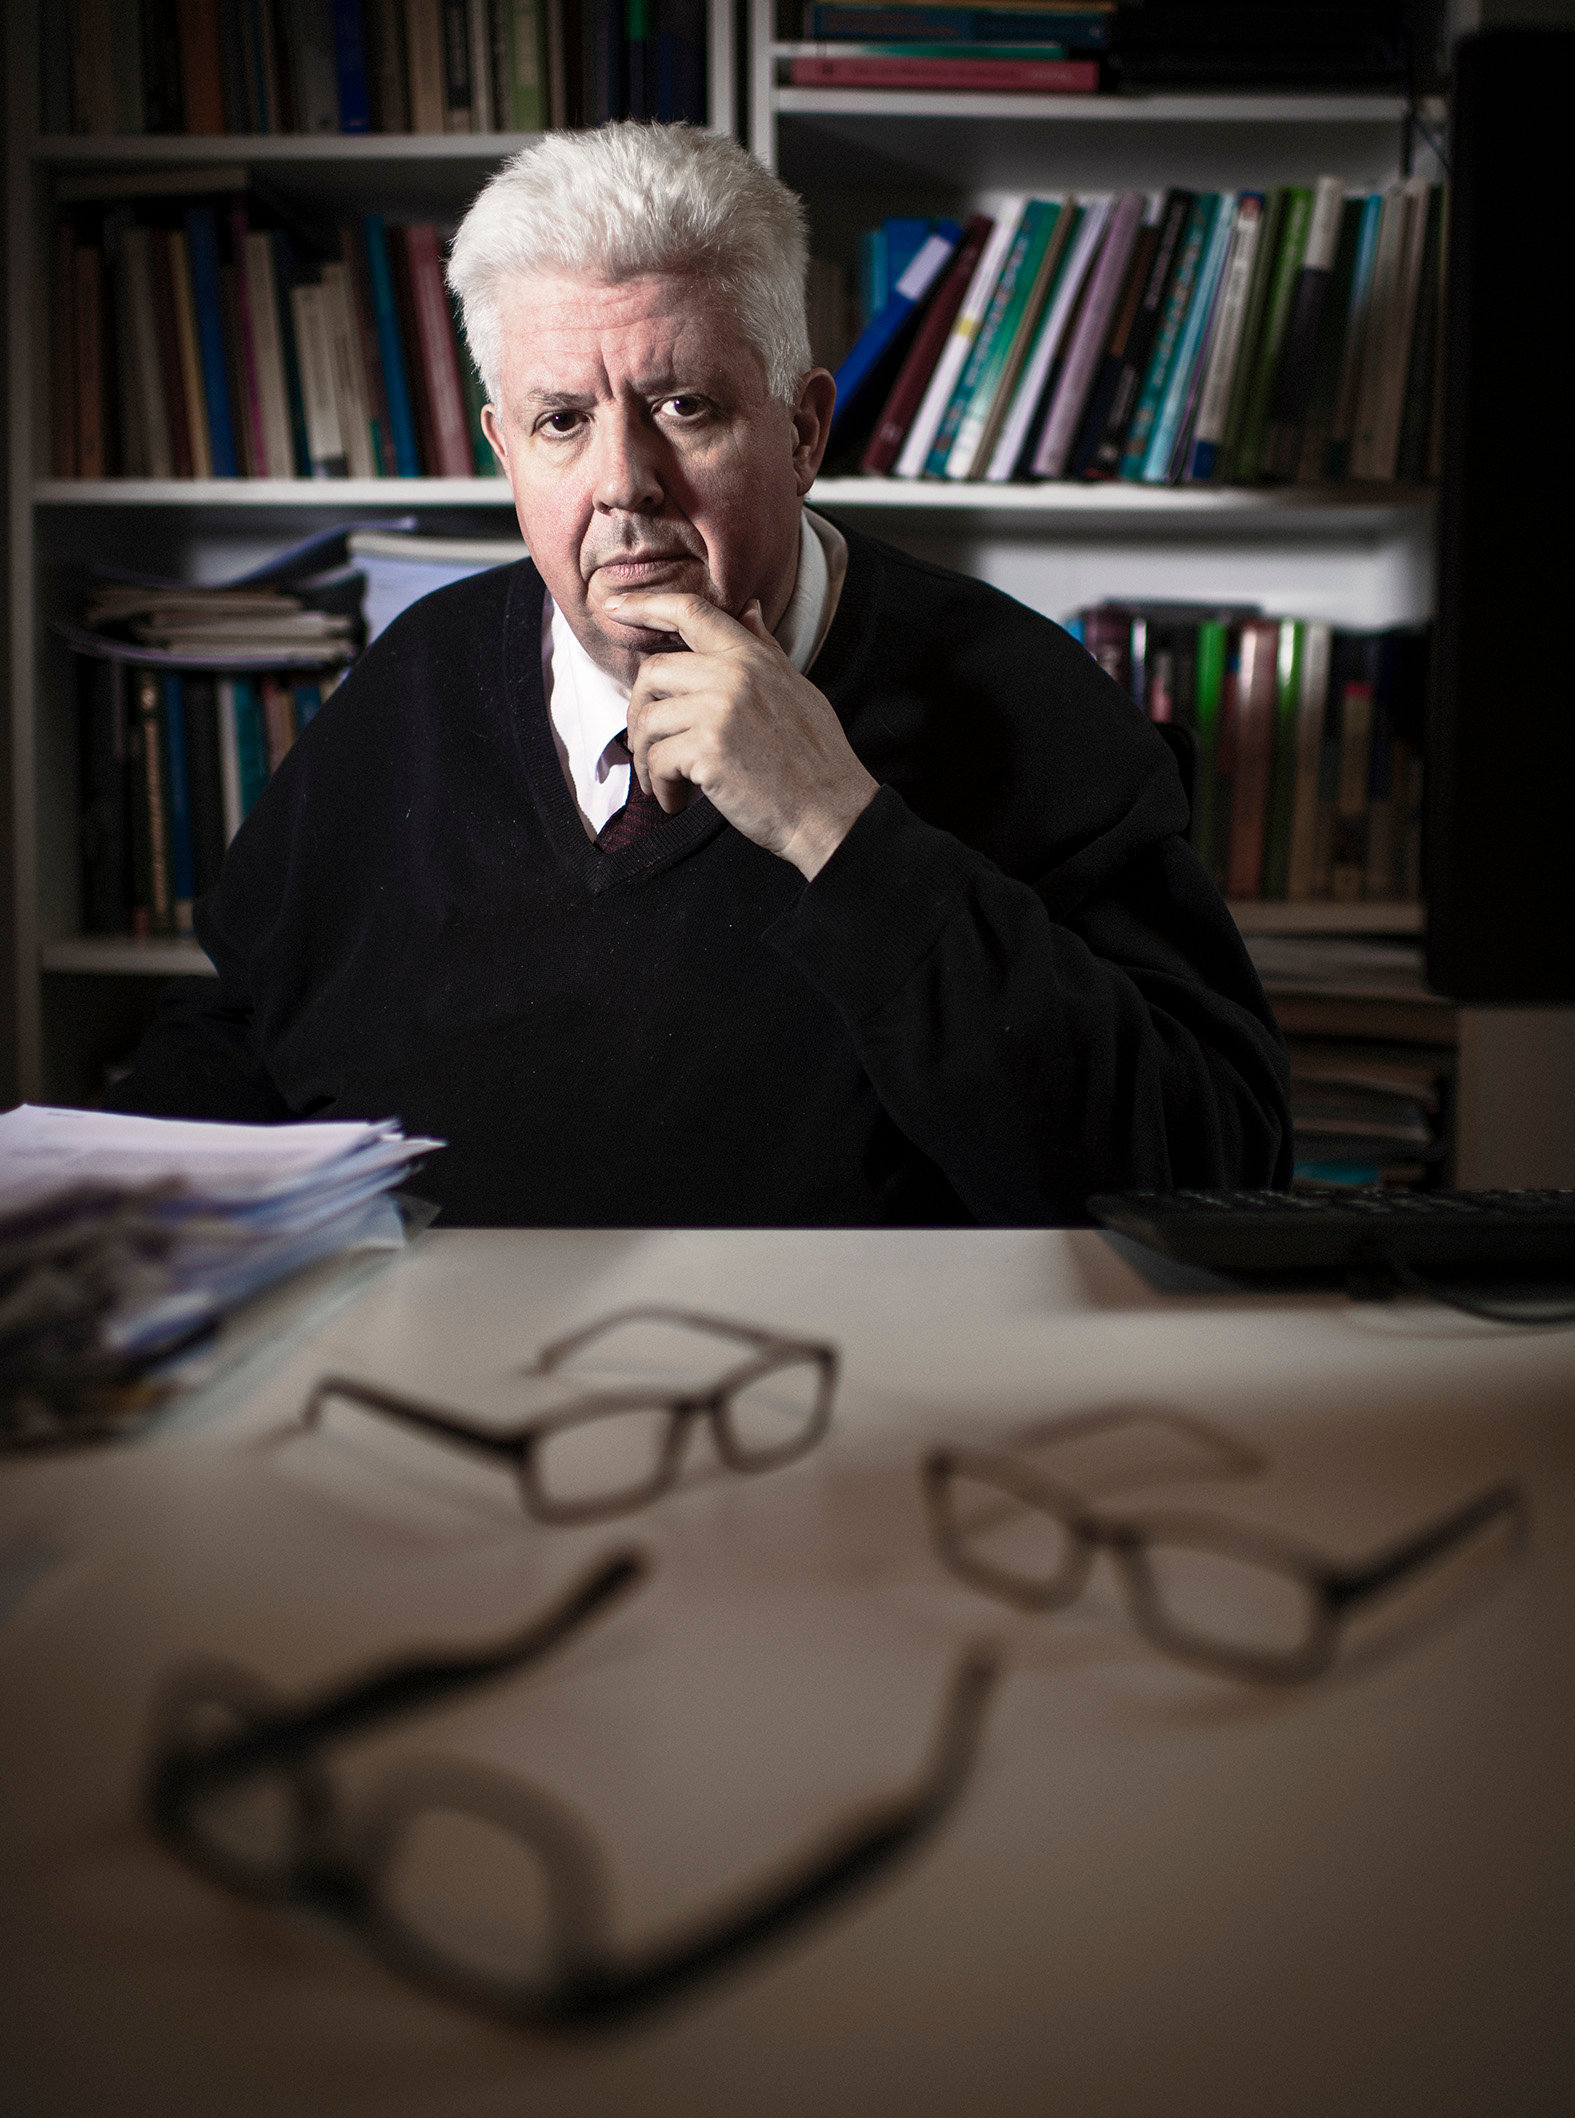 Hoogleraar Frist van der Meer, CAOP-professor Comparative Public Sector and Civil Reform